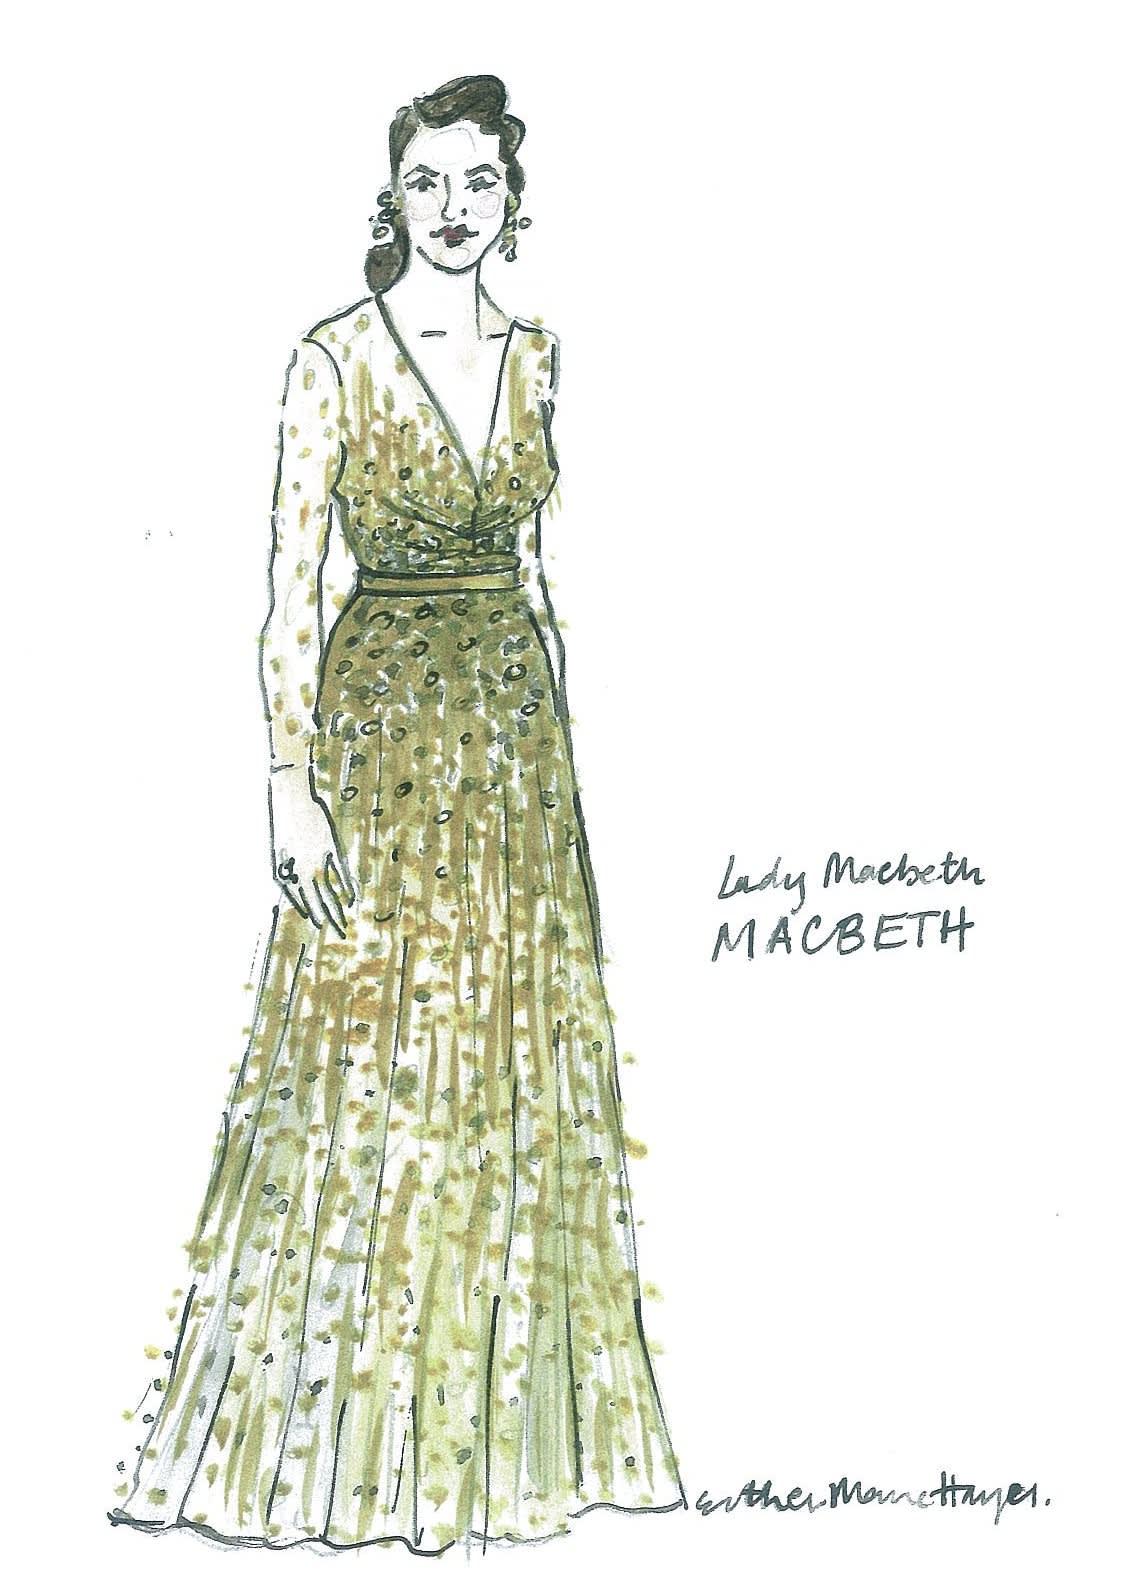 Lady_Macbeth_Banquet_Costume.jpg